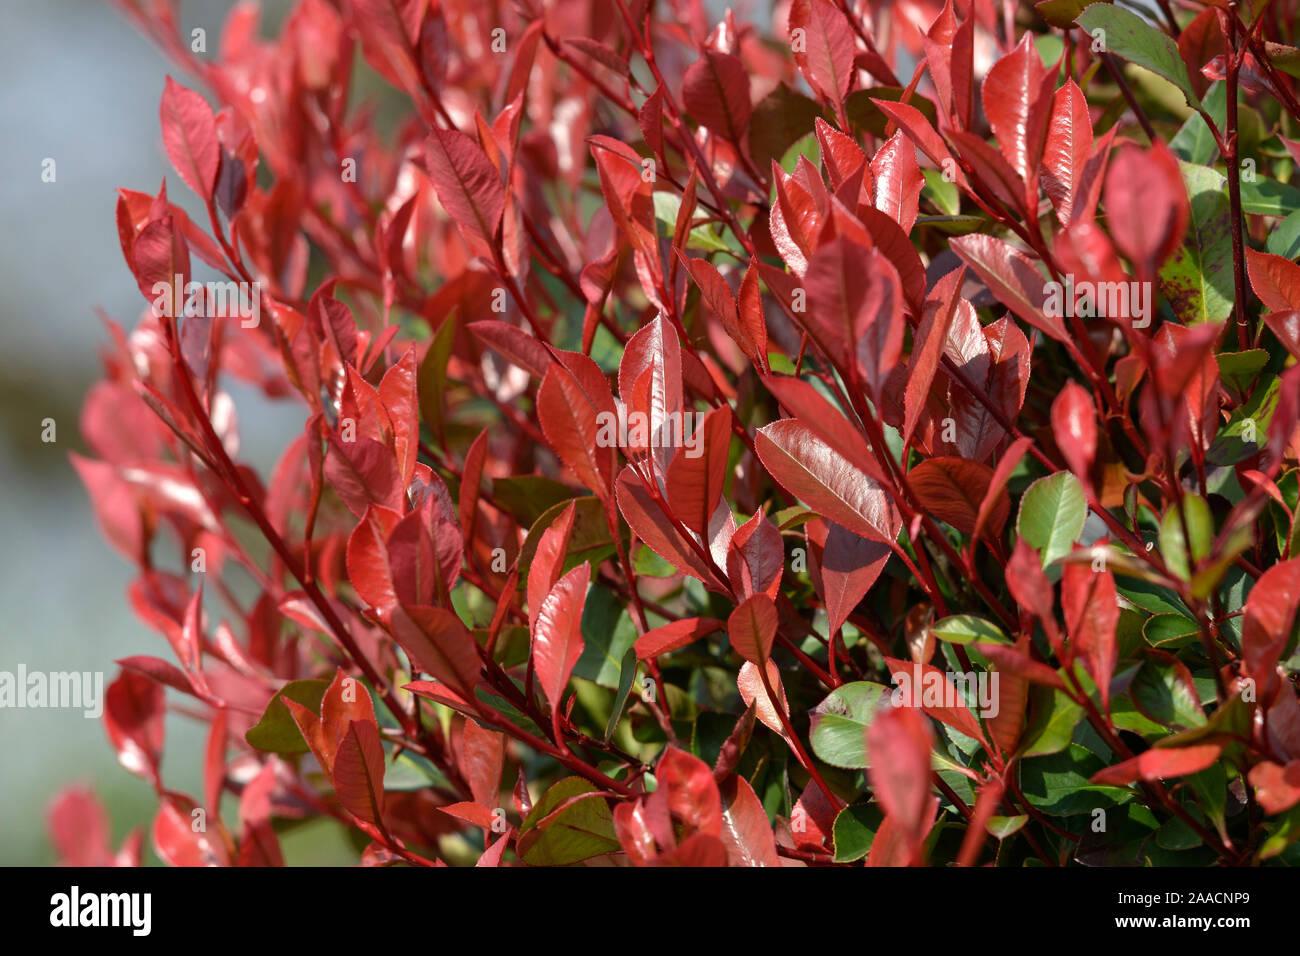 Glanzmispel (Photinia × fraseri 'Little Red Robin') Stock Photo